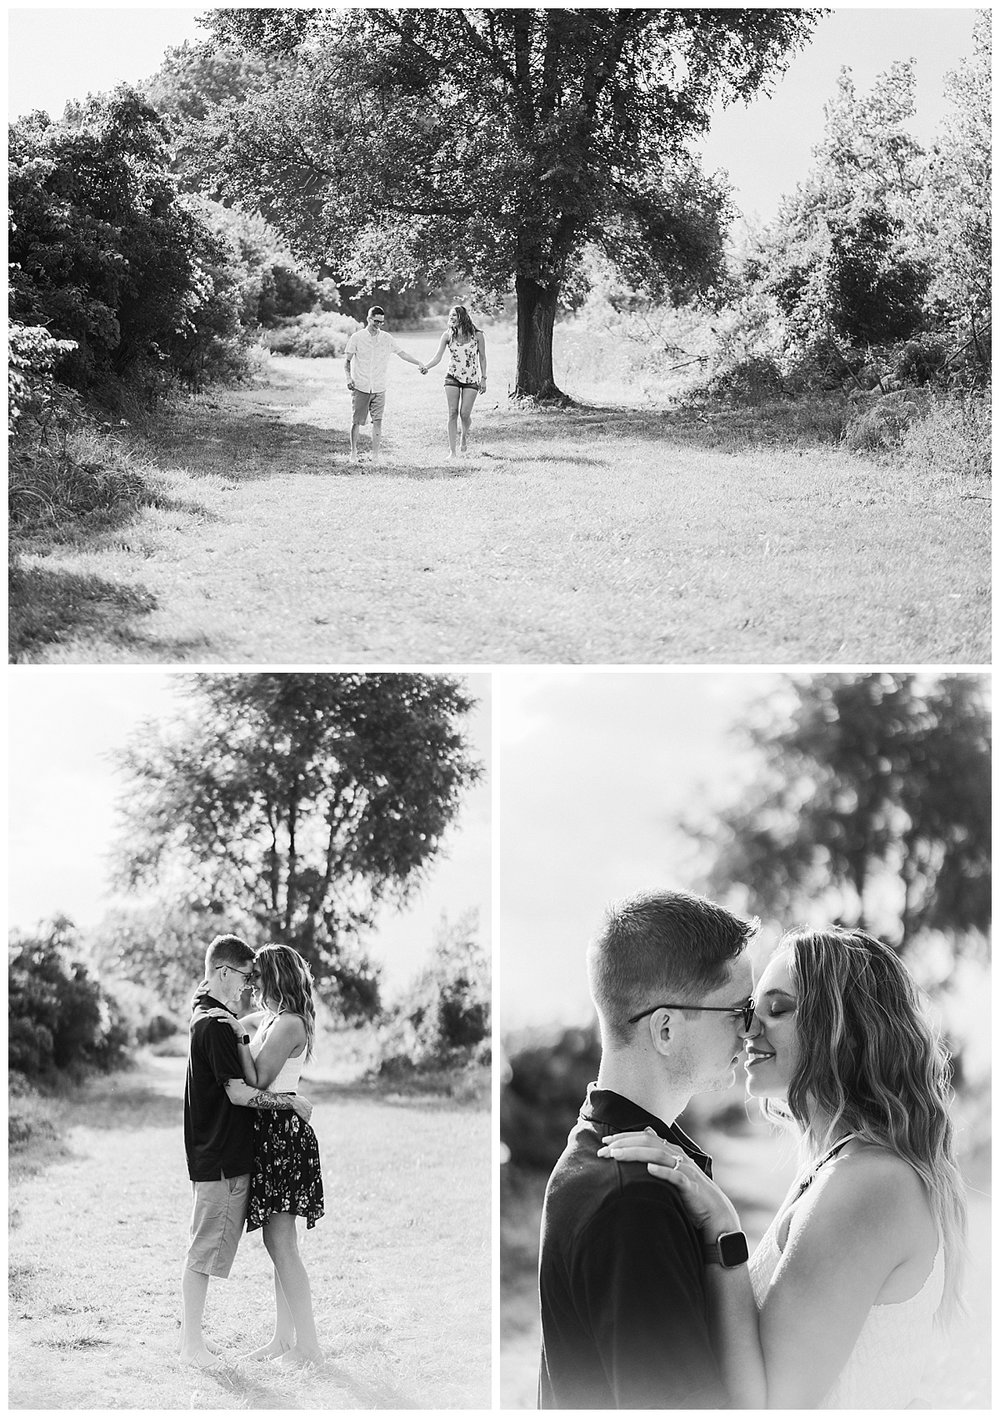 Nashville Wedding Photographer_N&L Engagement Session-8